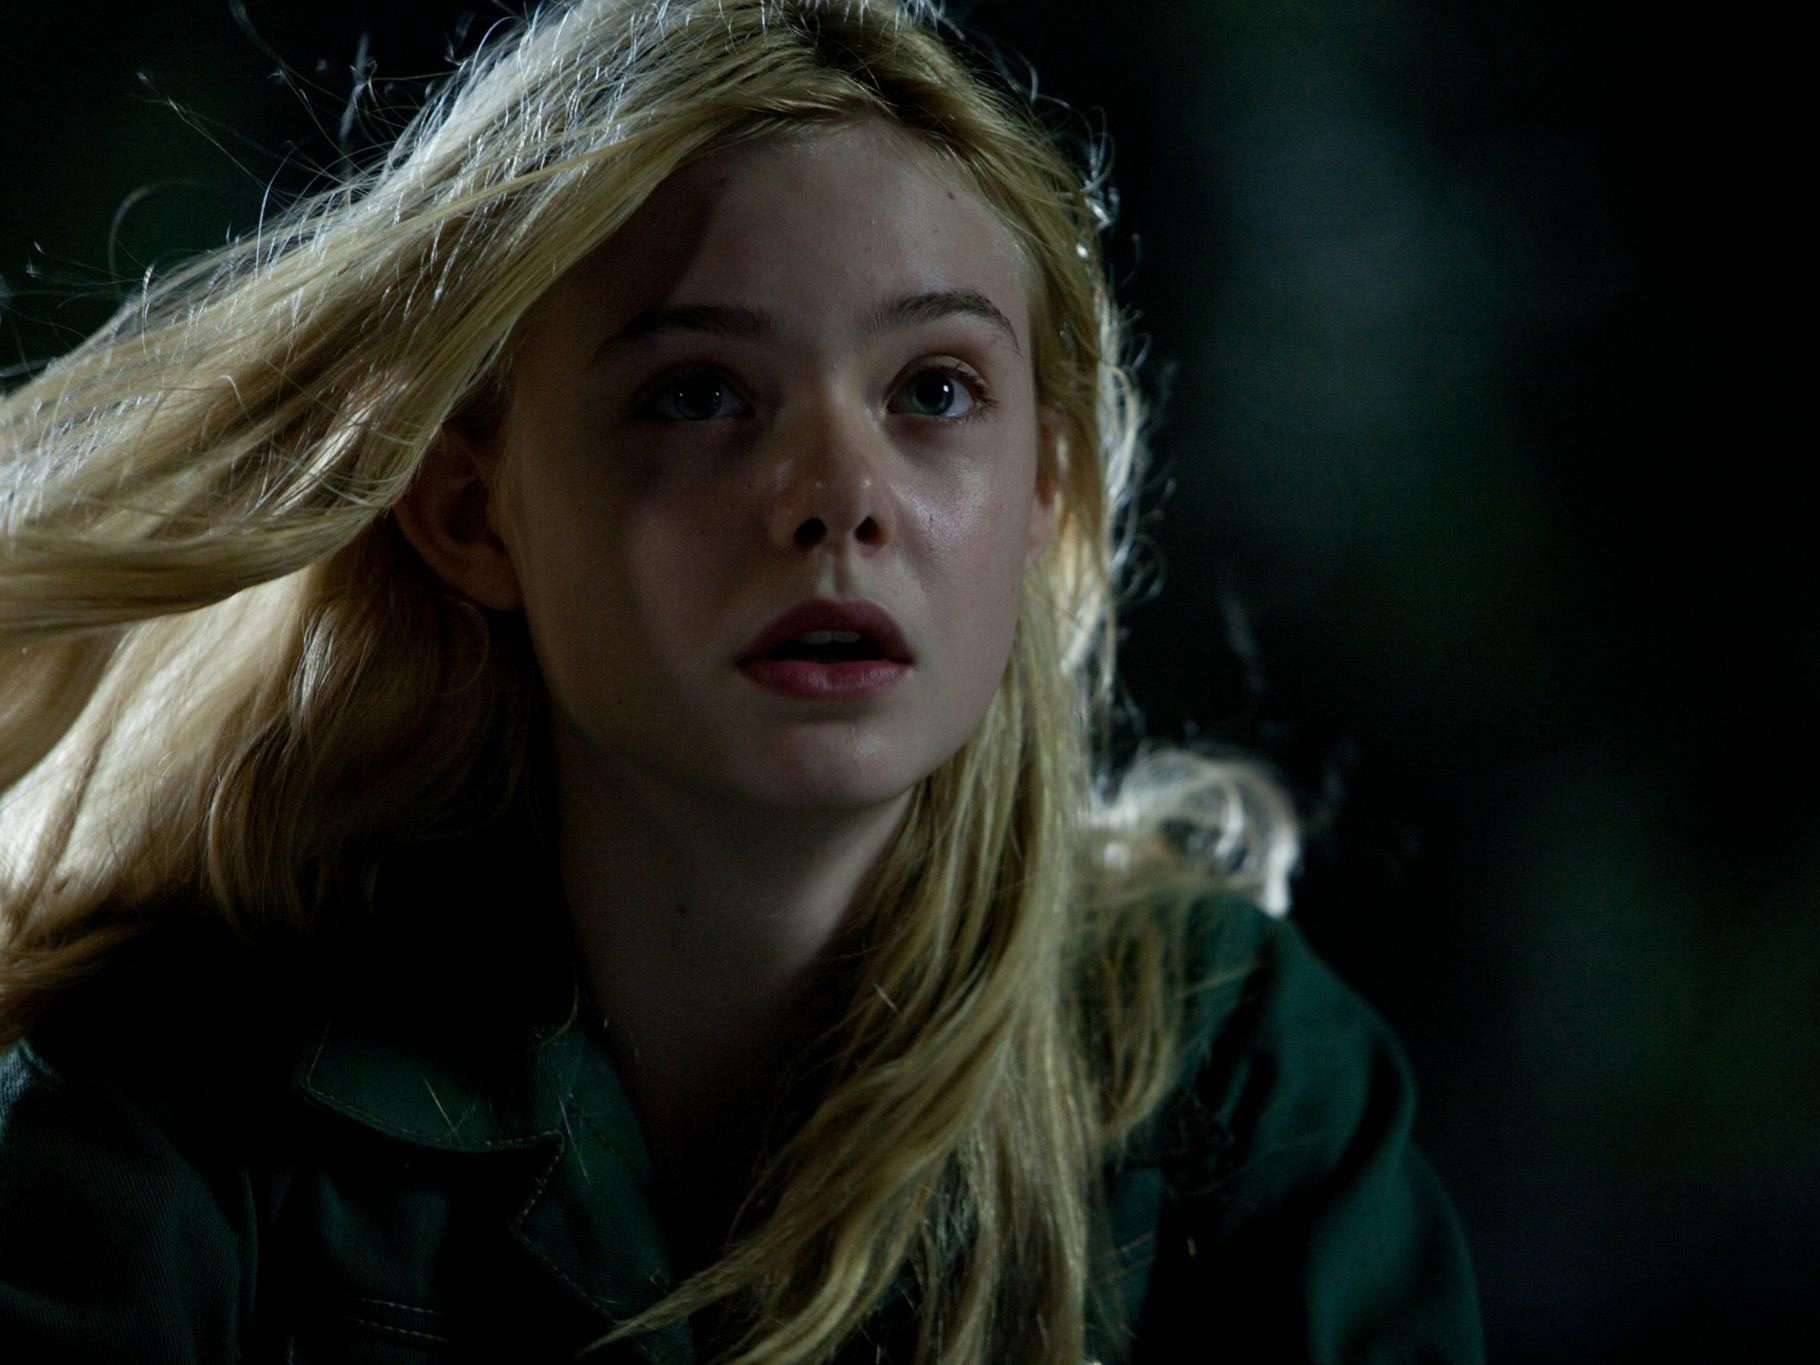 Best sci-fi movies on Netflix - Super 8